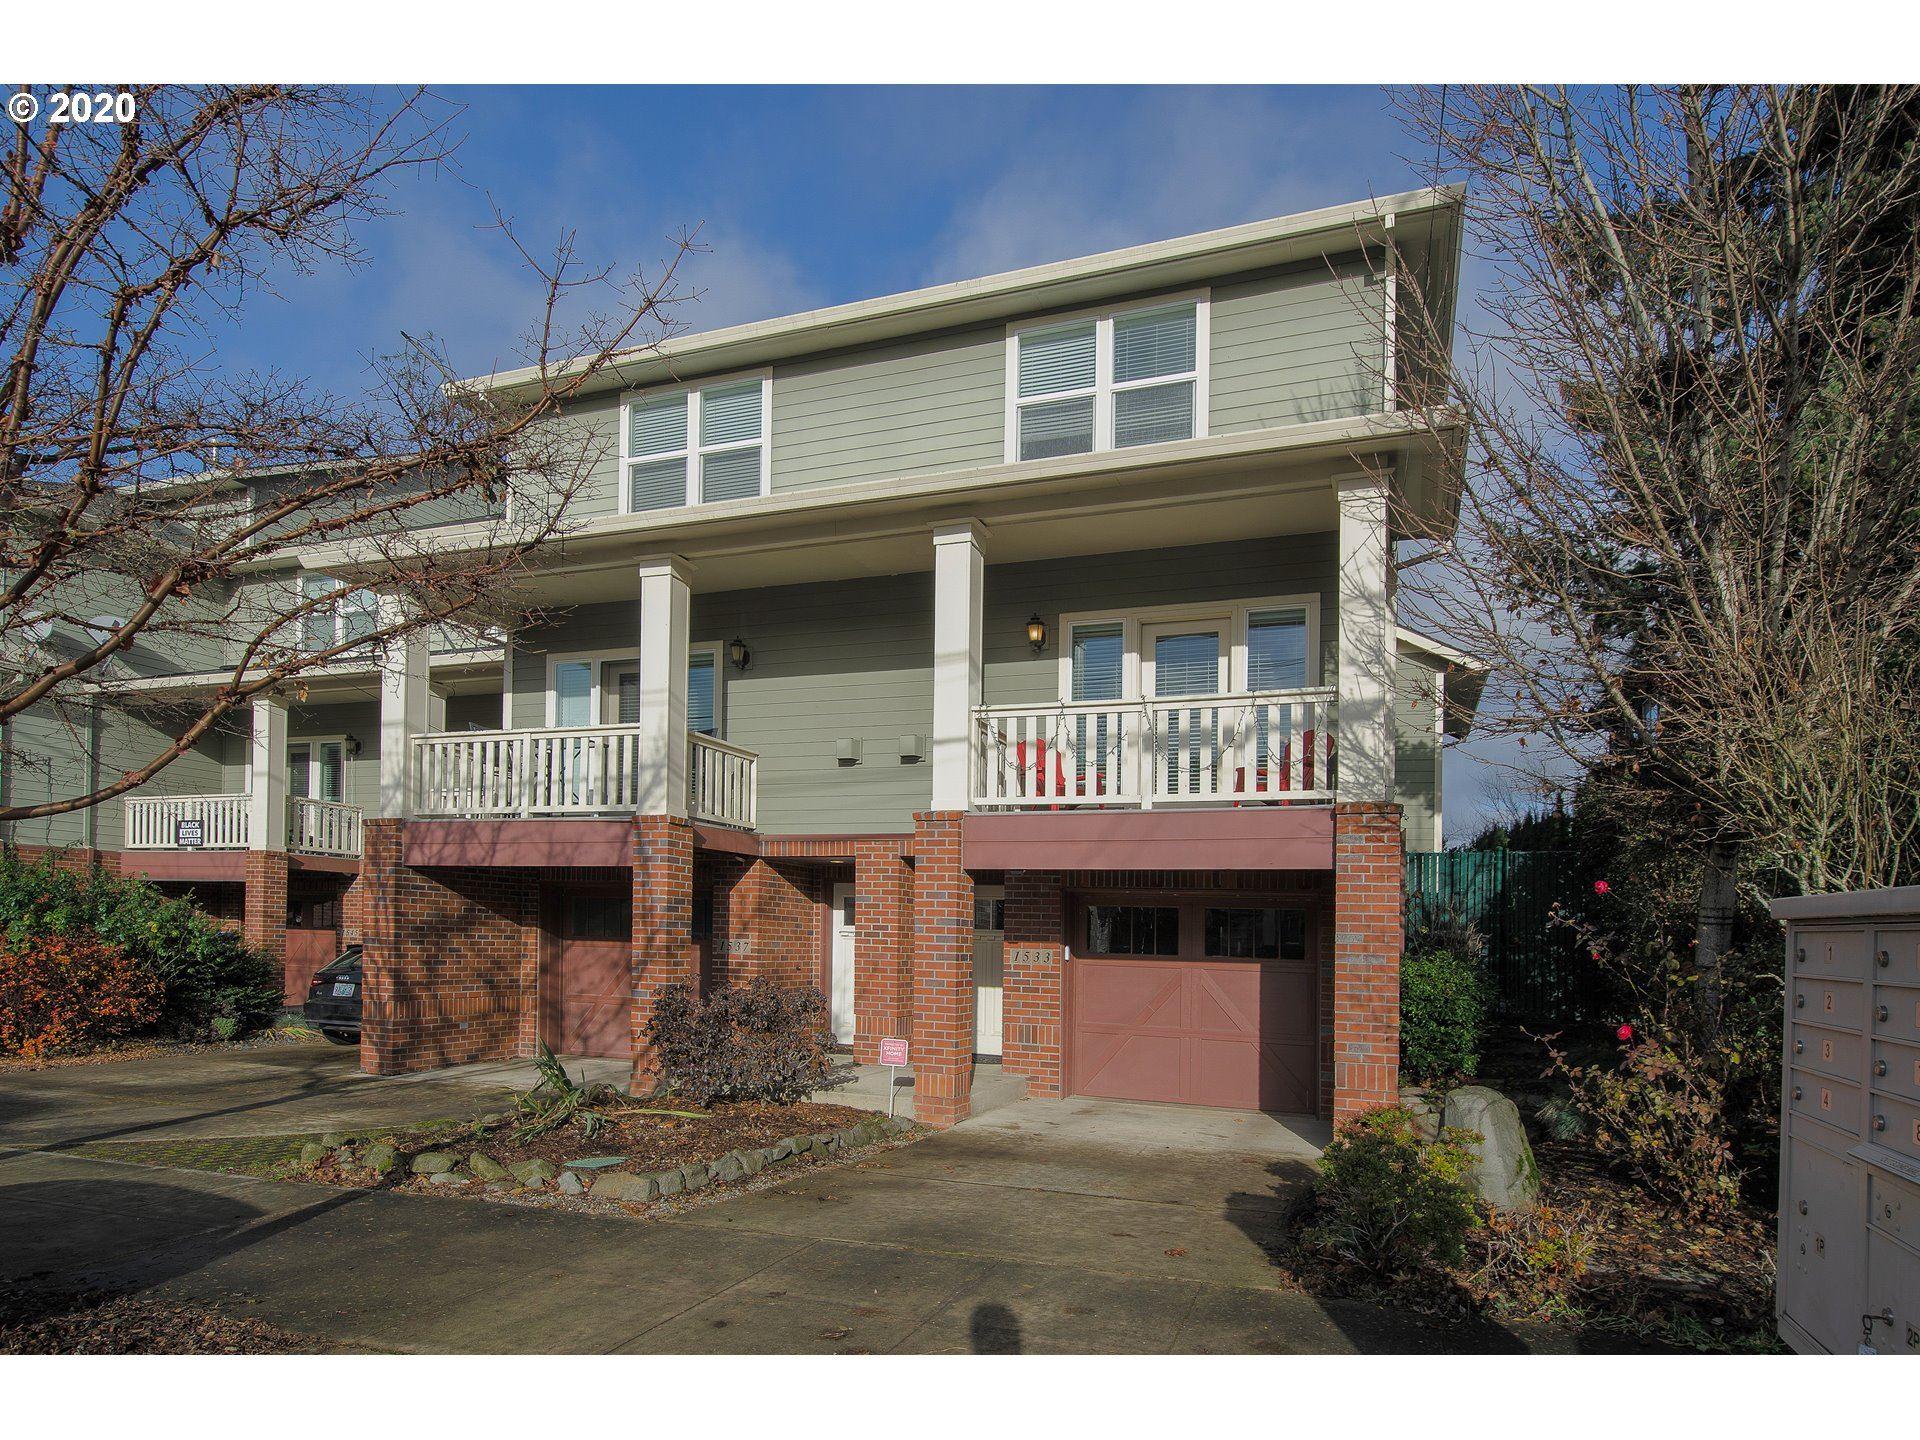 1533 N PRESCOTT ST, Portland, OR 97217 - MLS#: 20672515